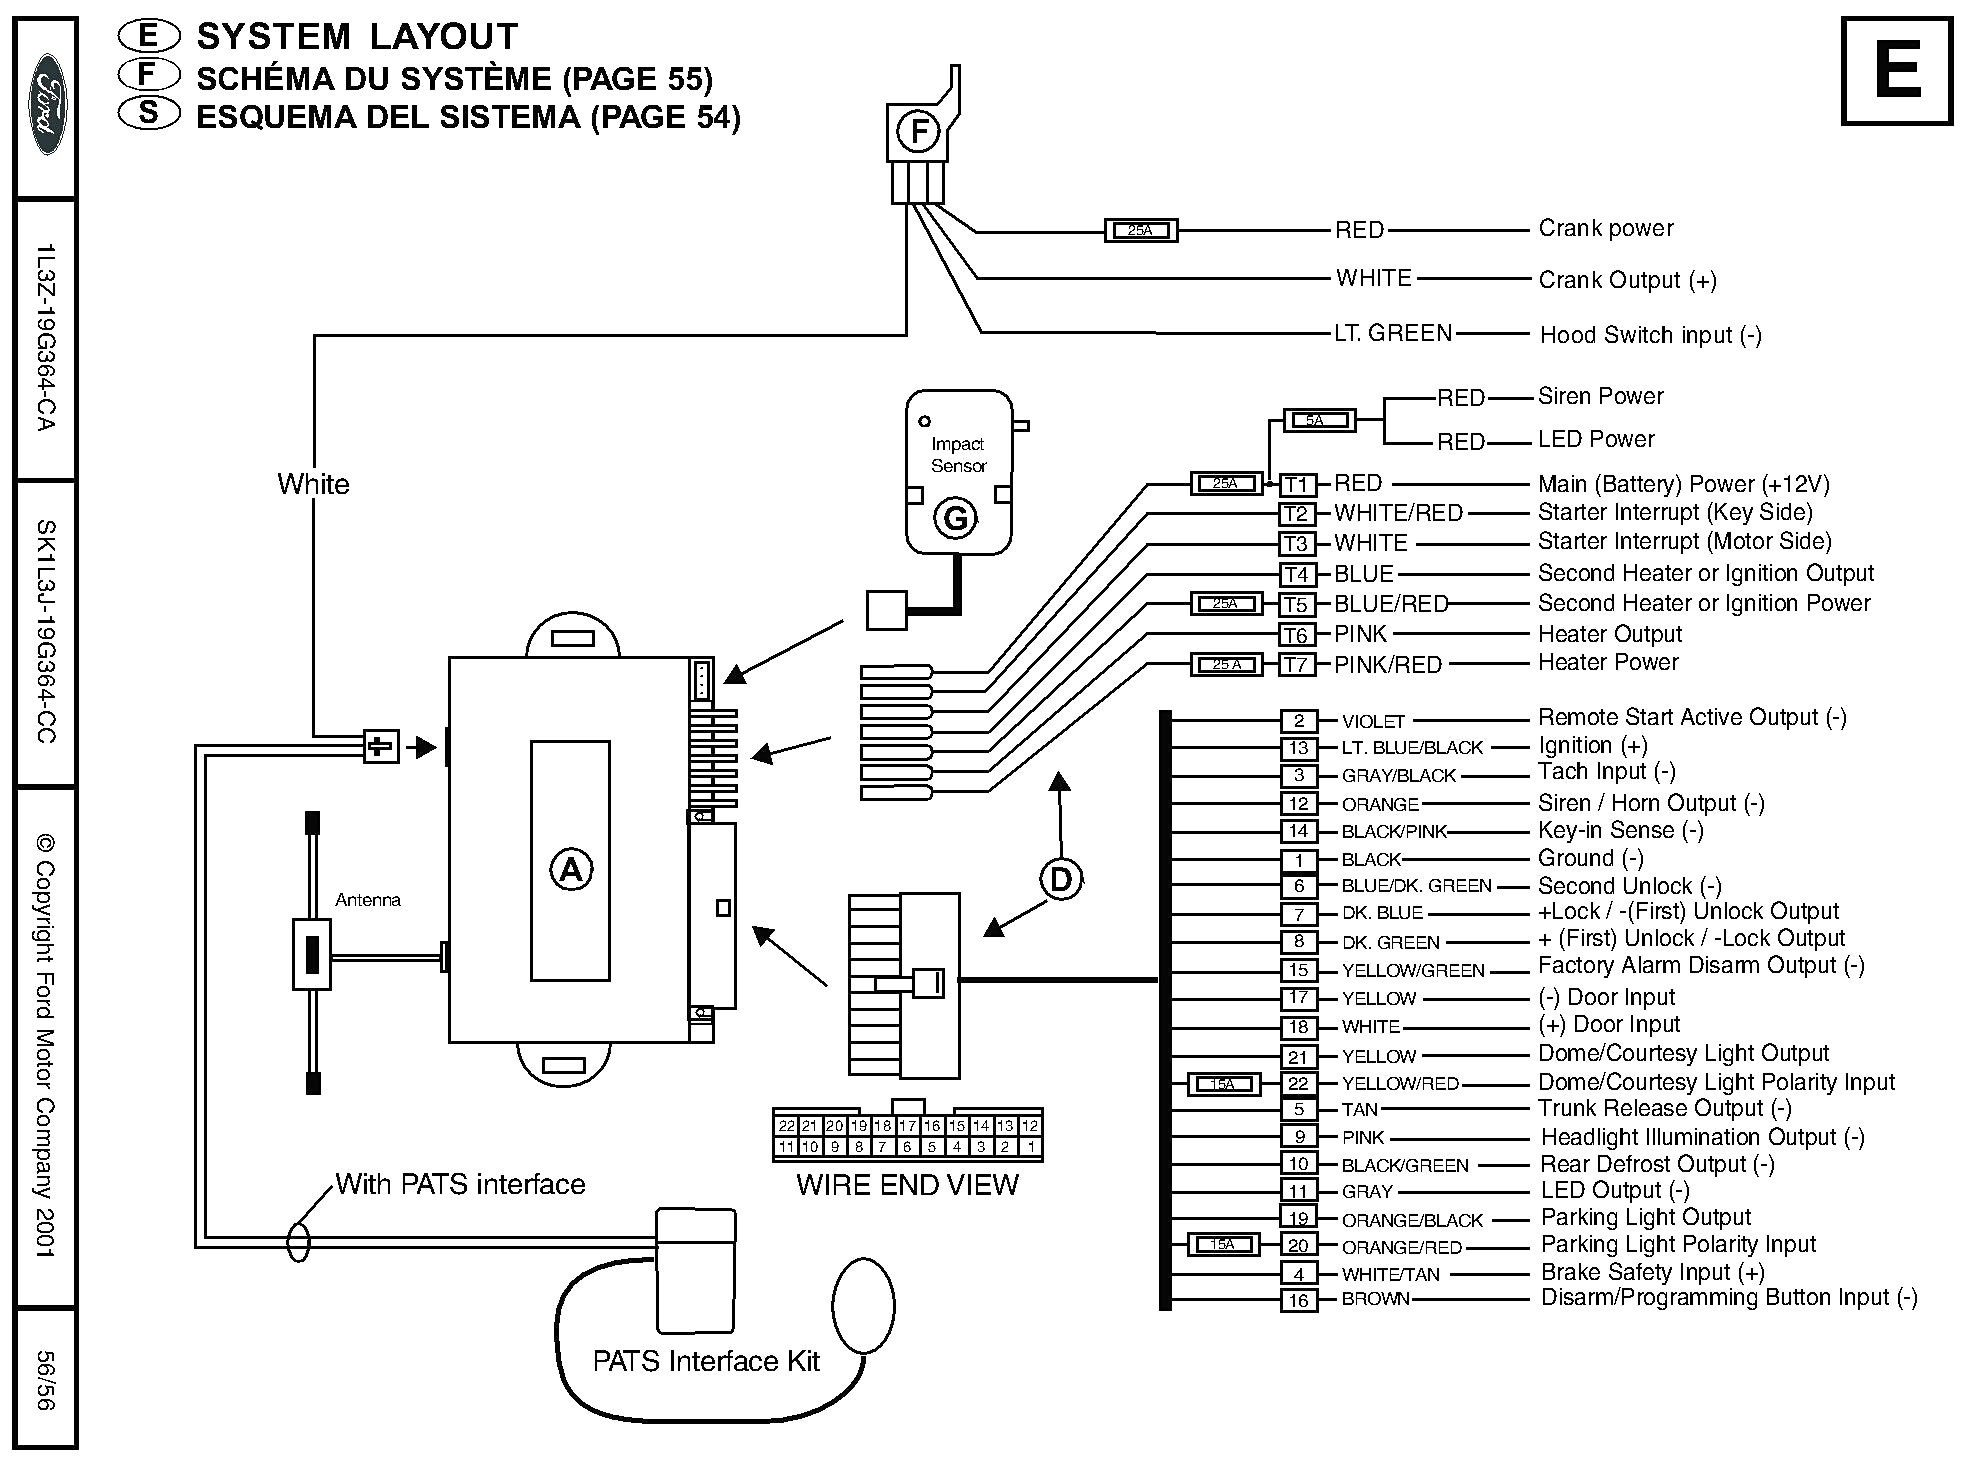 Pin By Michele F Jordan Radio Wiri On Starter Wiring In 2020 Electrical Wiring Diagram Remote Car Starter Remote Start